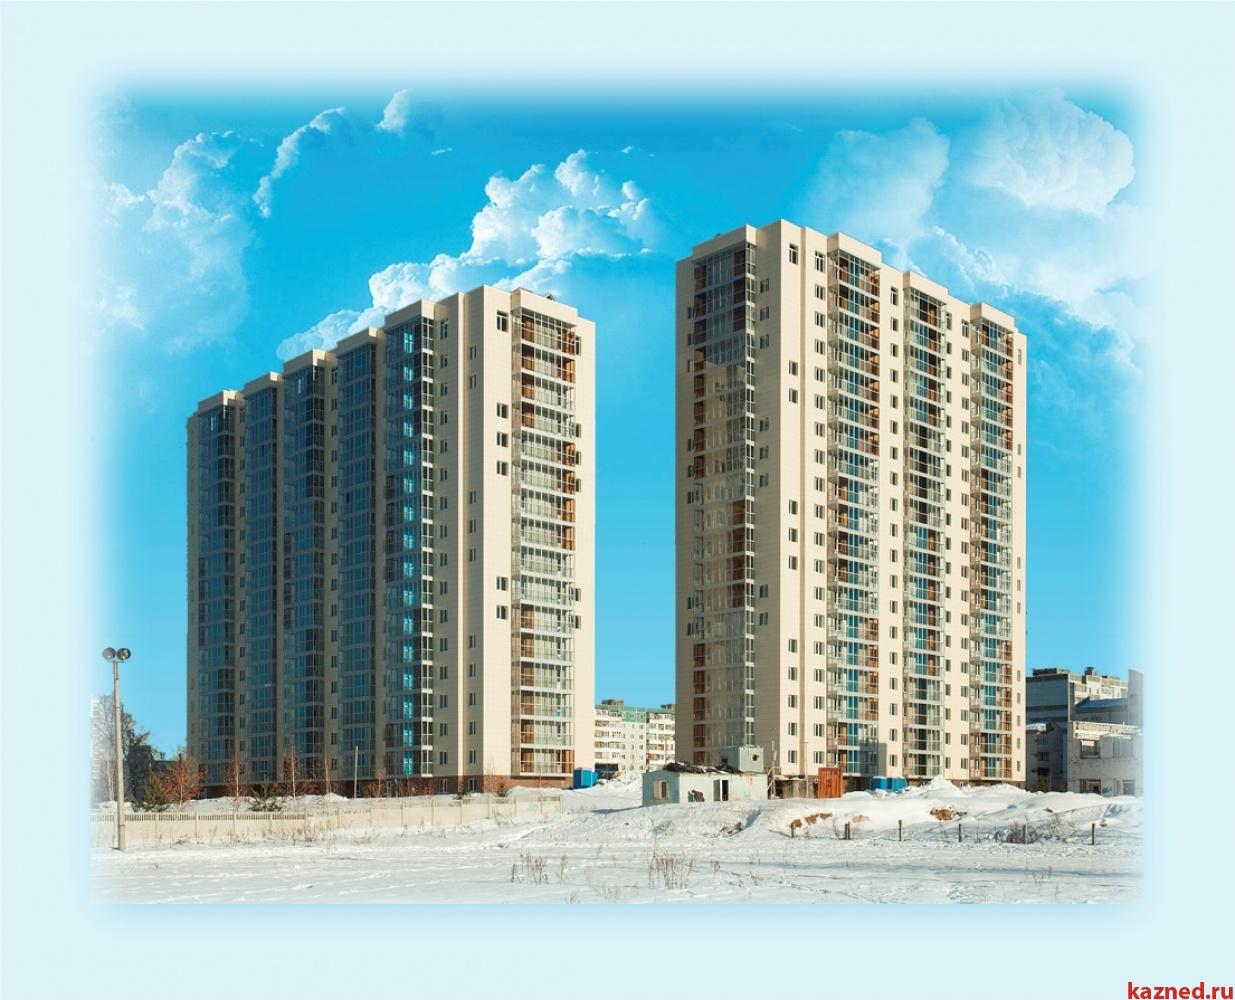 Продажа 2-к квартиры Фучика,14В, 74 м² (миниатюра №3)